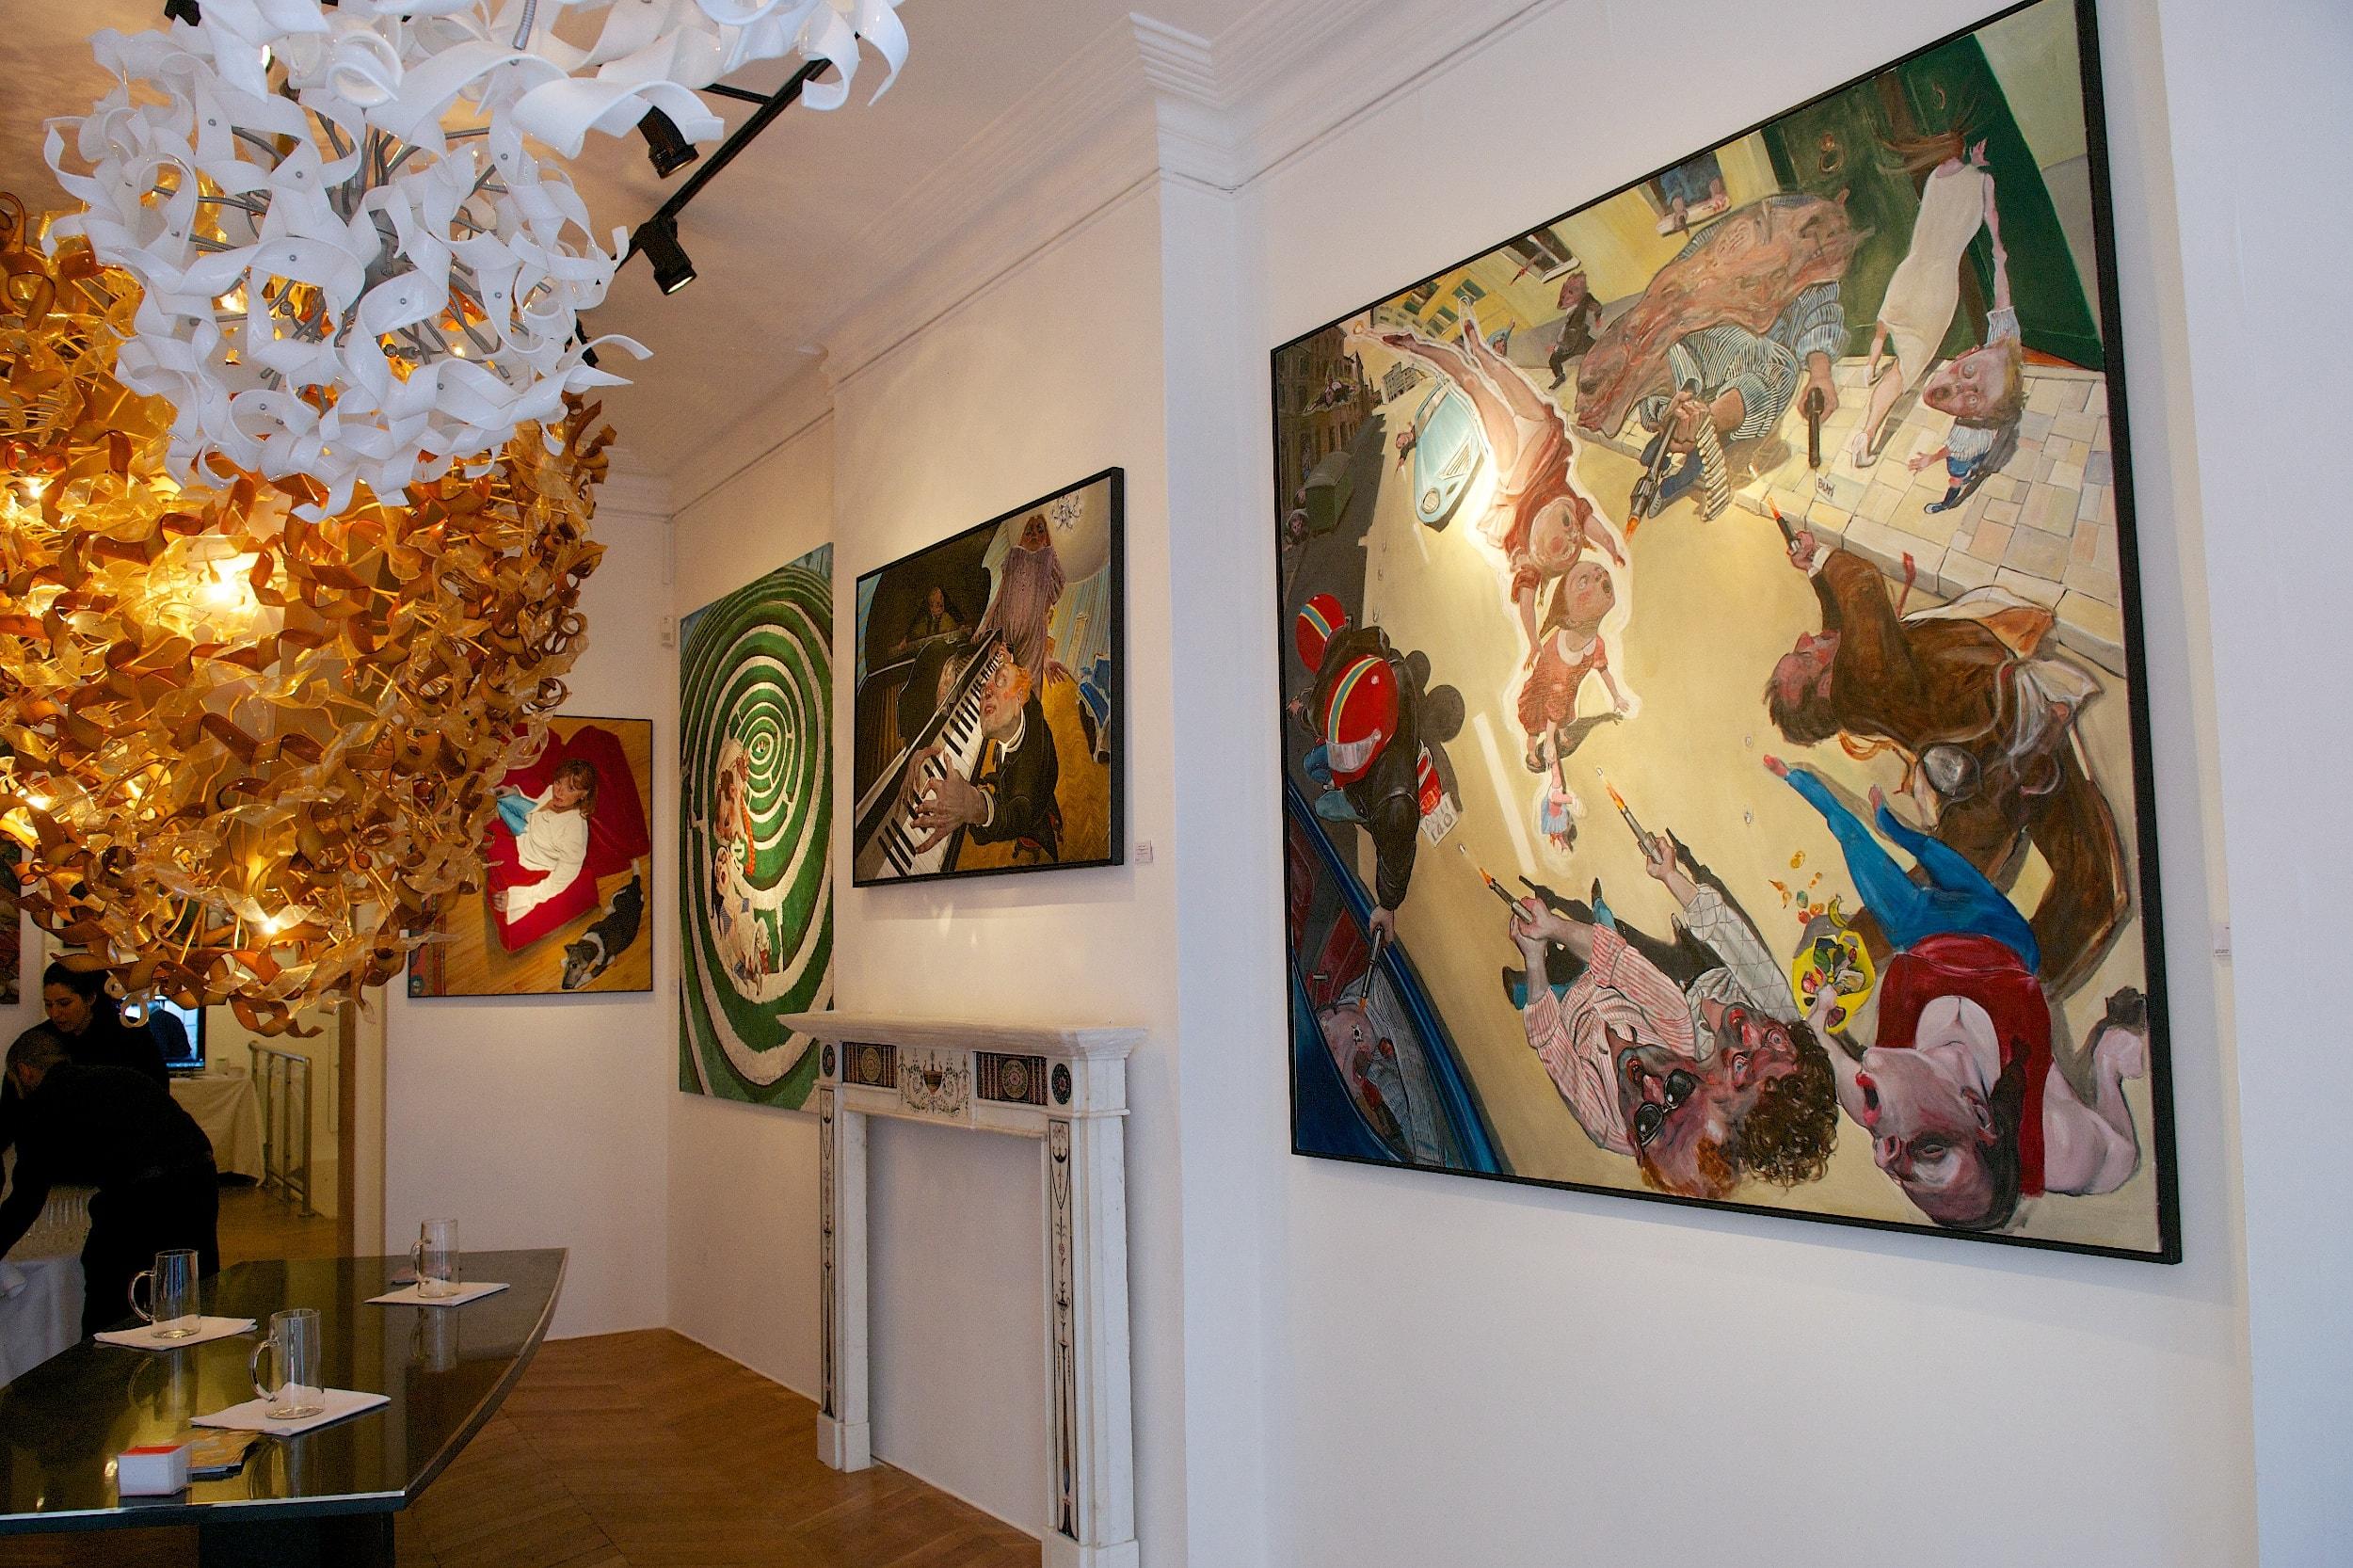 1-exhibition-photo-enrico-robusti-ransom-art-gallery-min.jpg